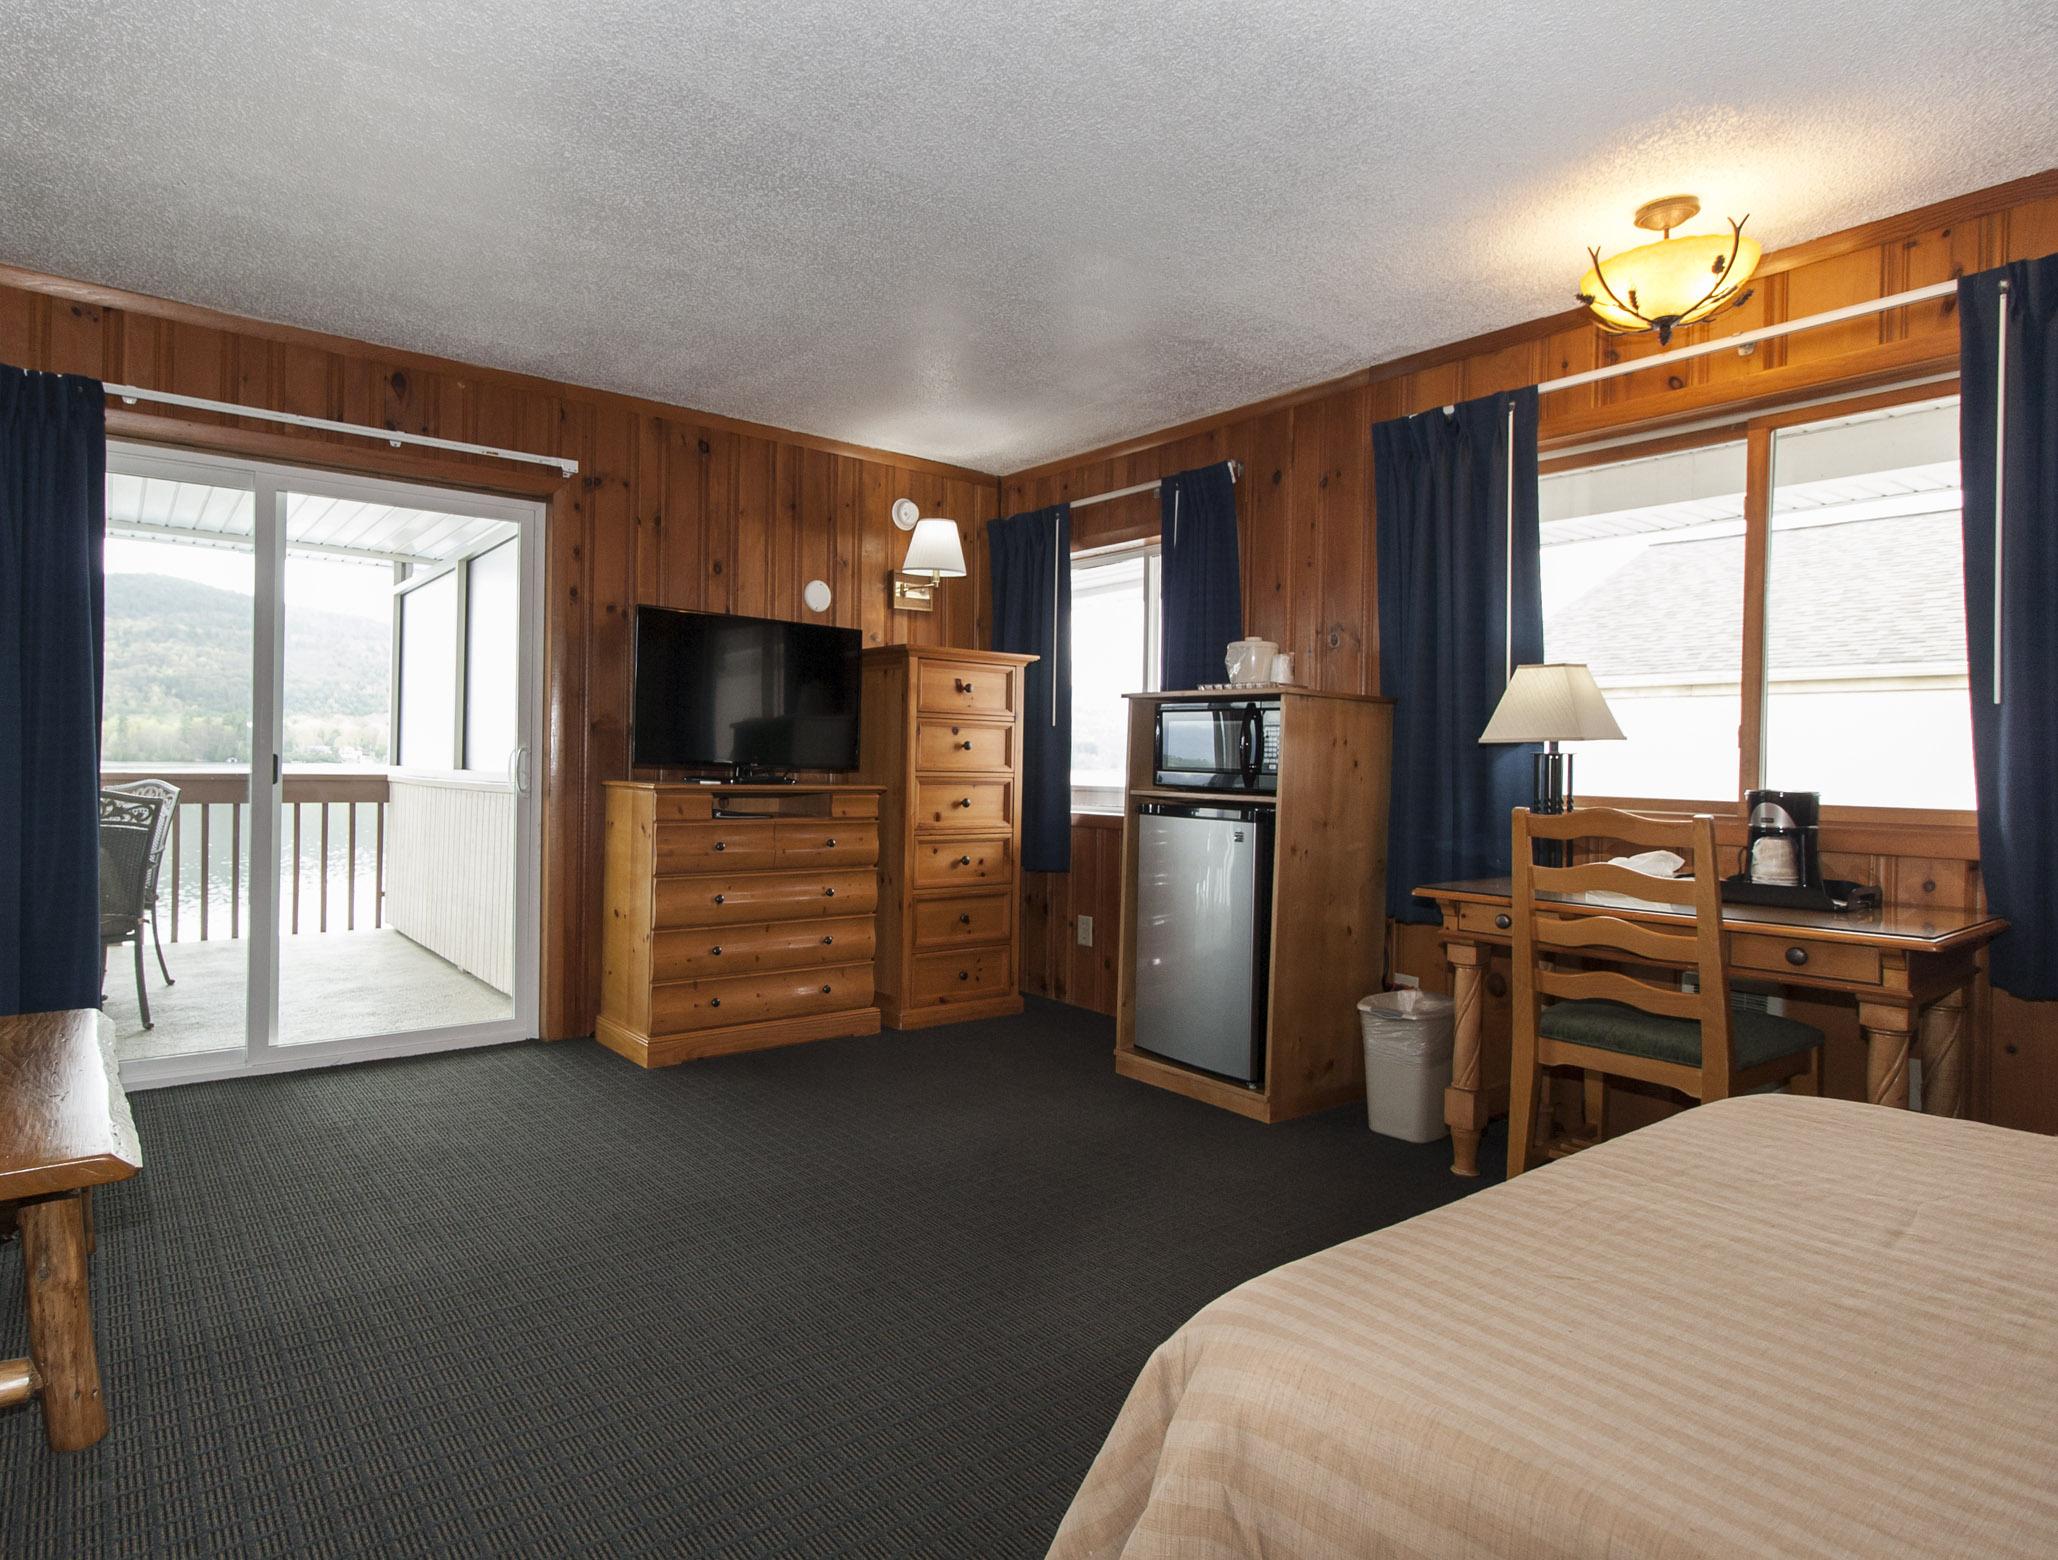 Lake Motel Room with sliding glass door to balcony